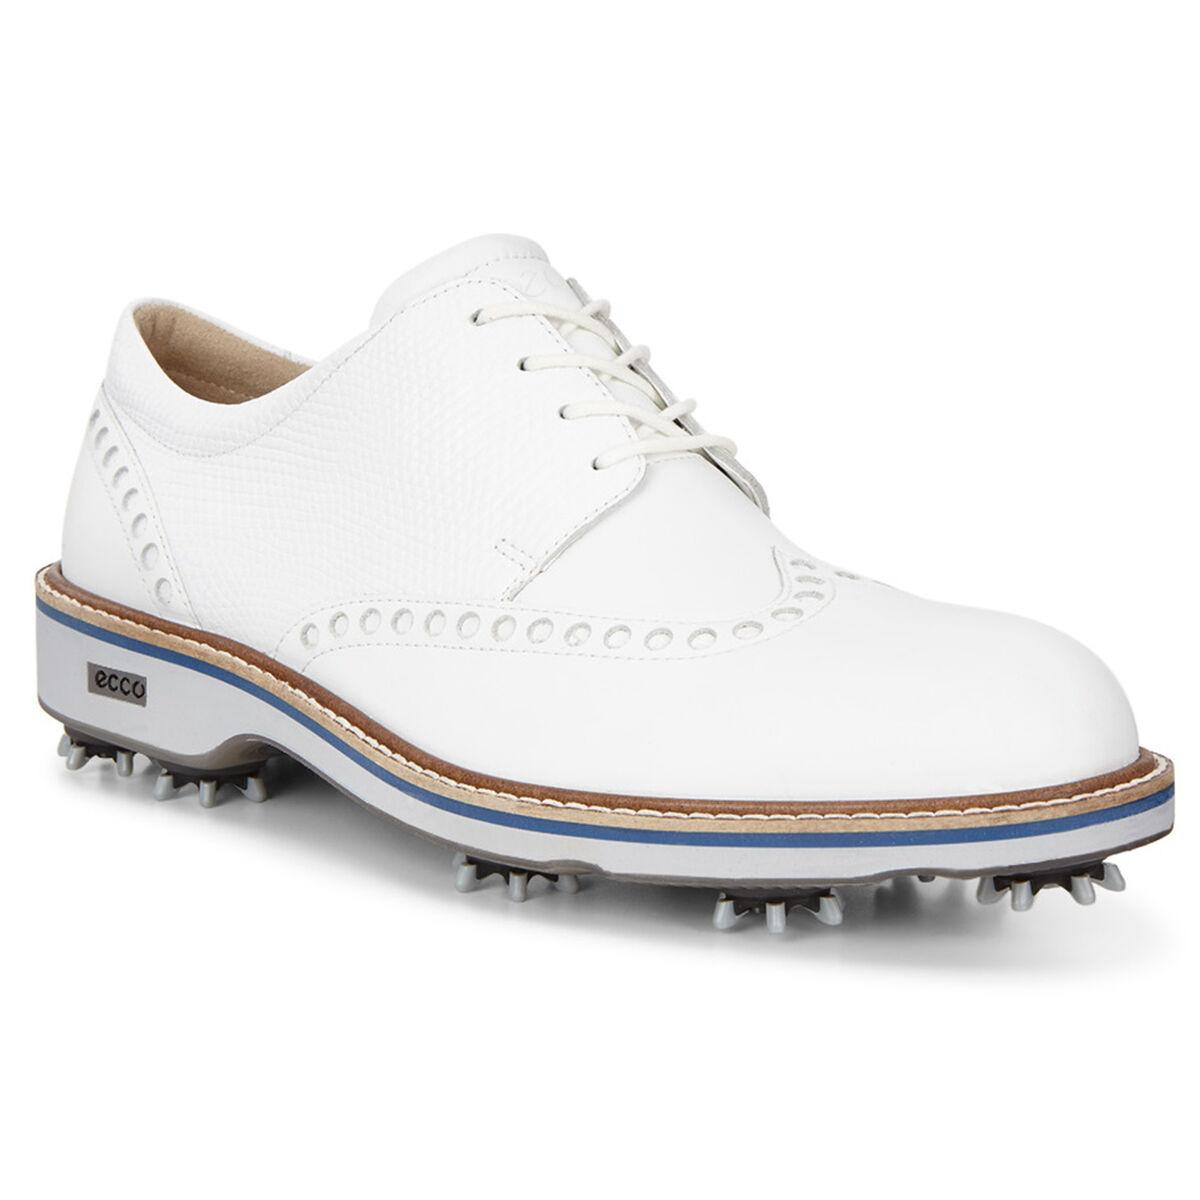 25d6f629a8 ECCO Lux Men's Golf Shoe - White